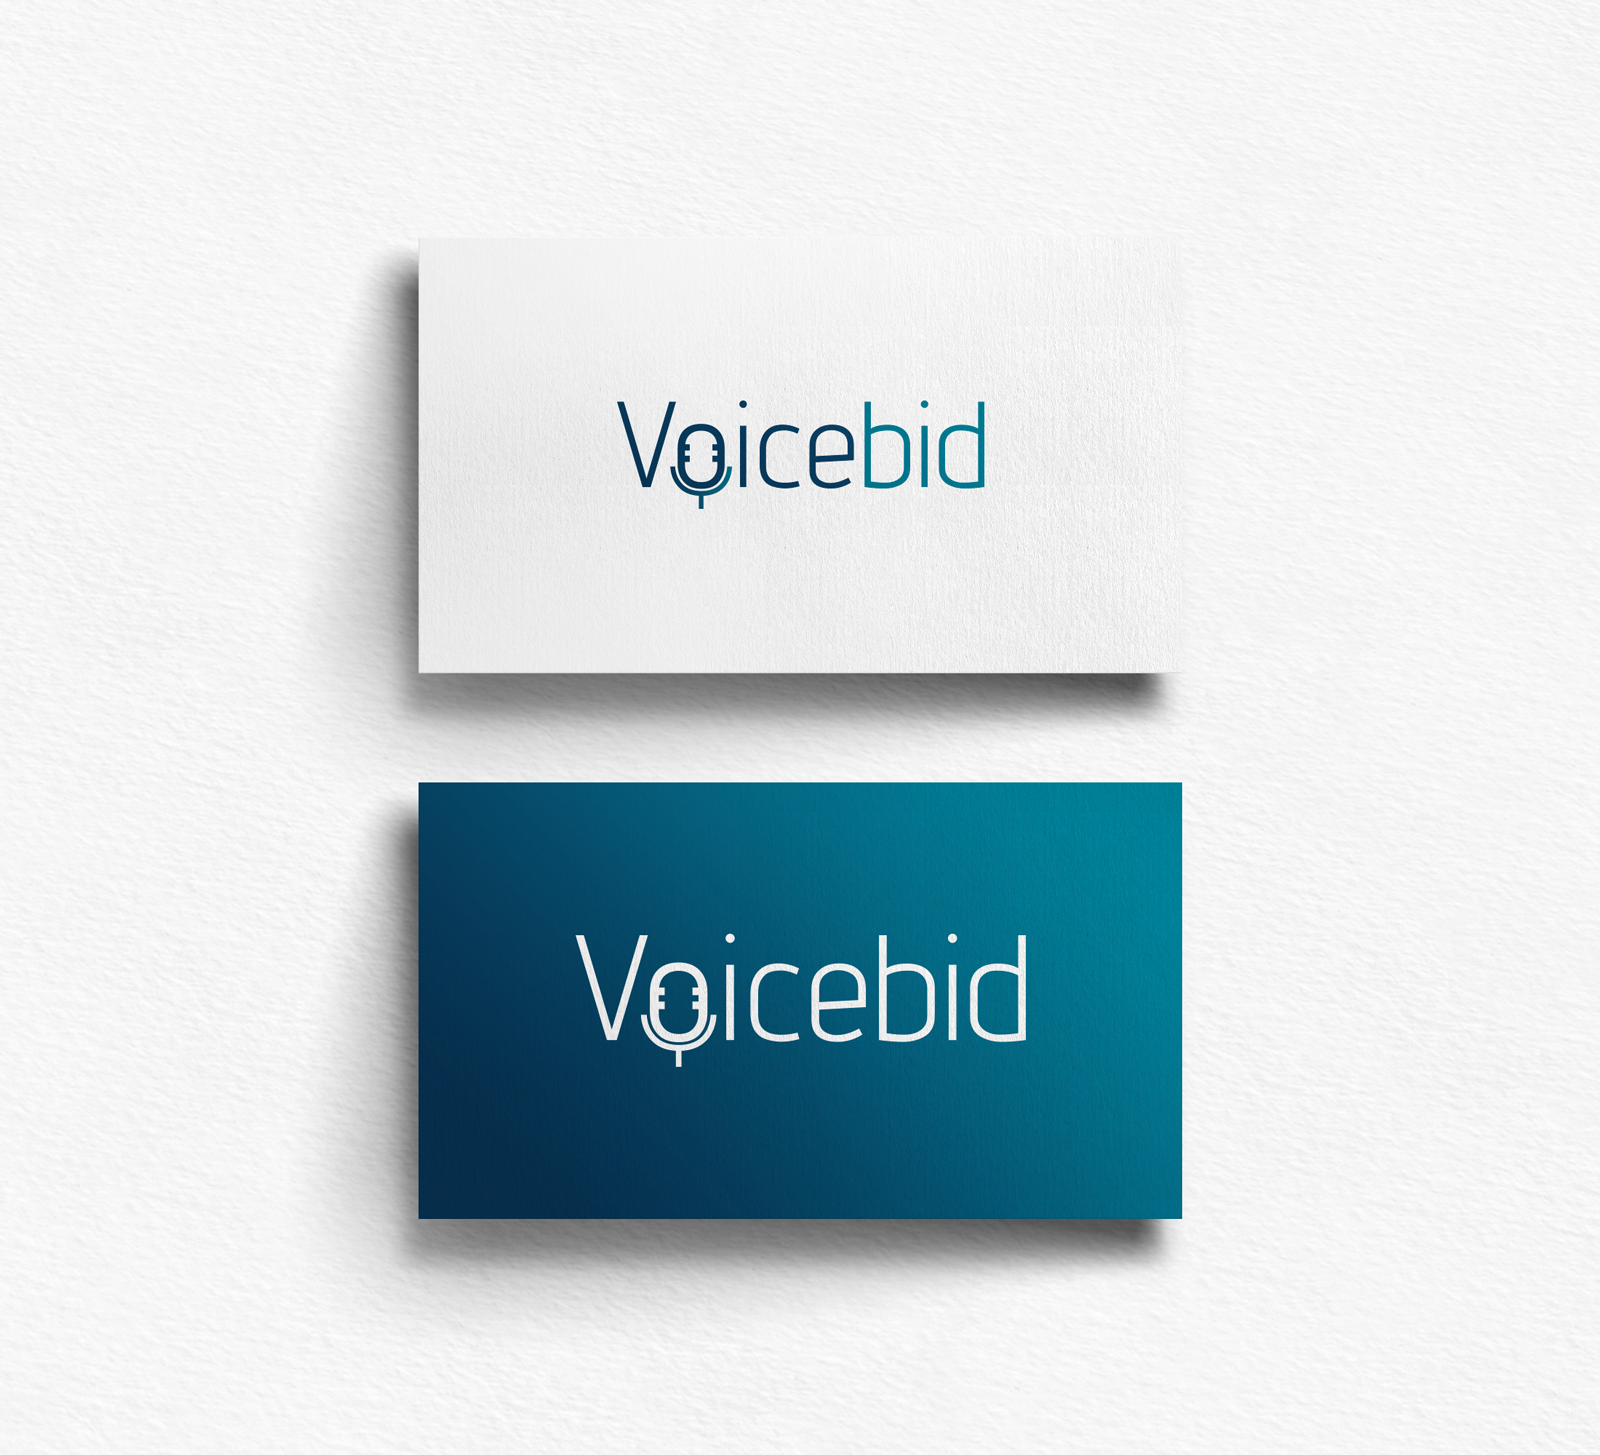 Voicebid